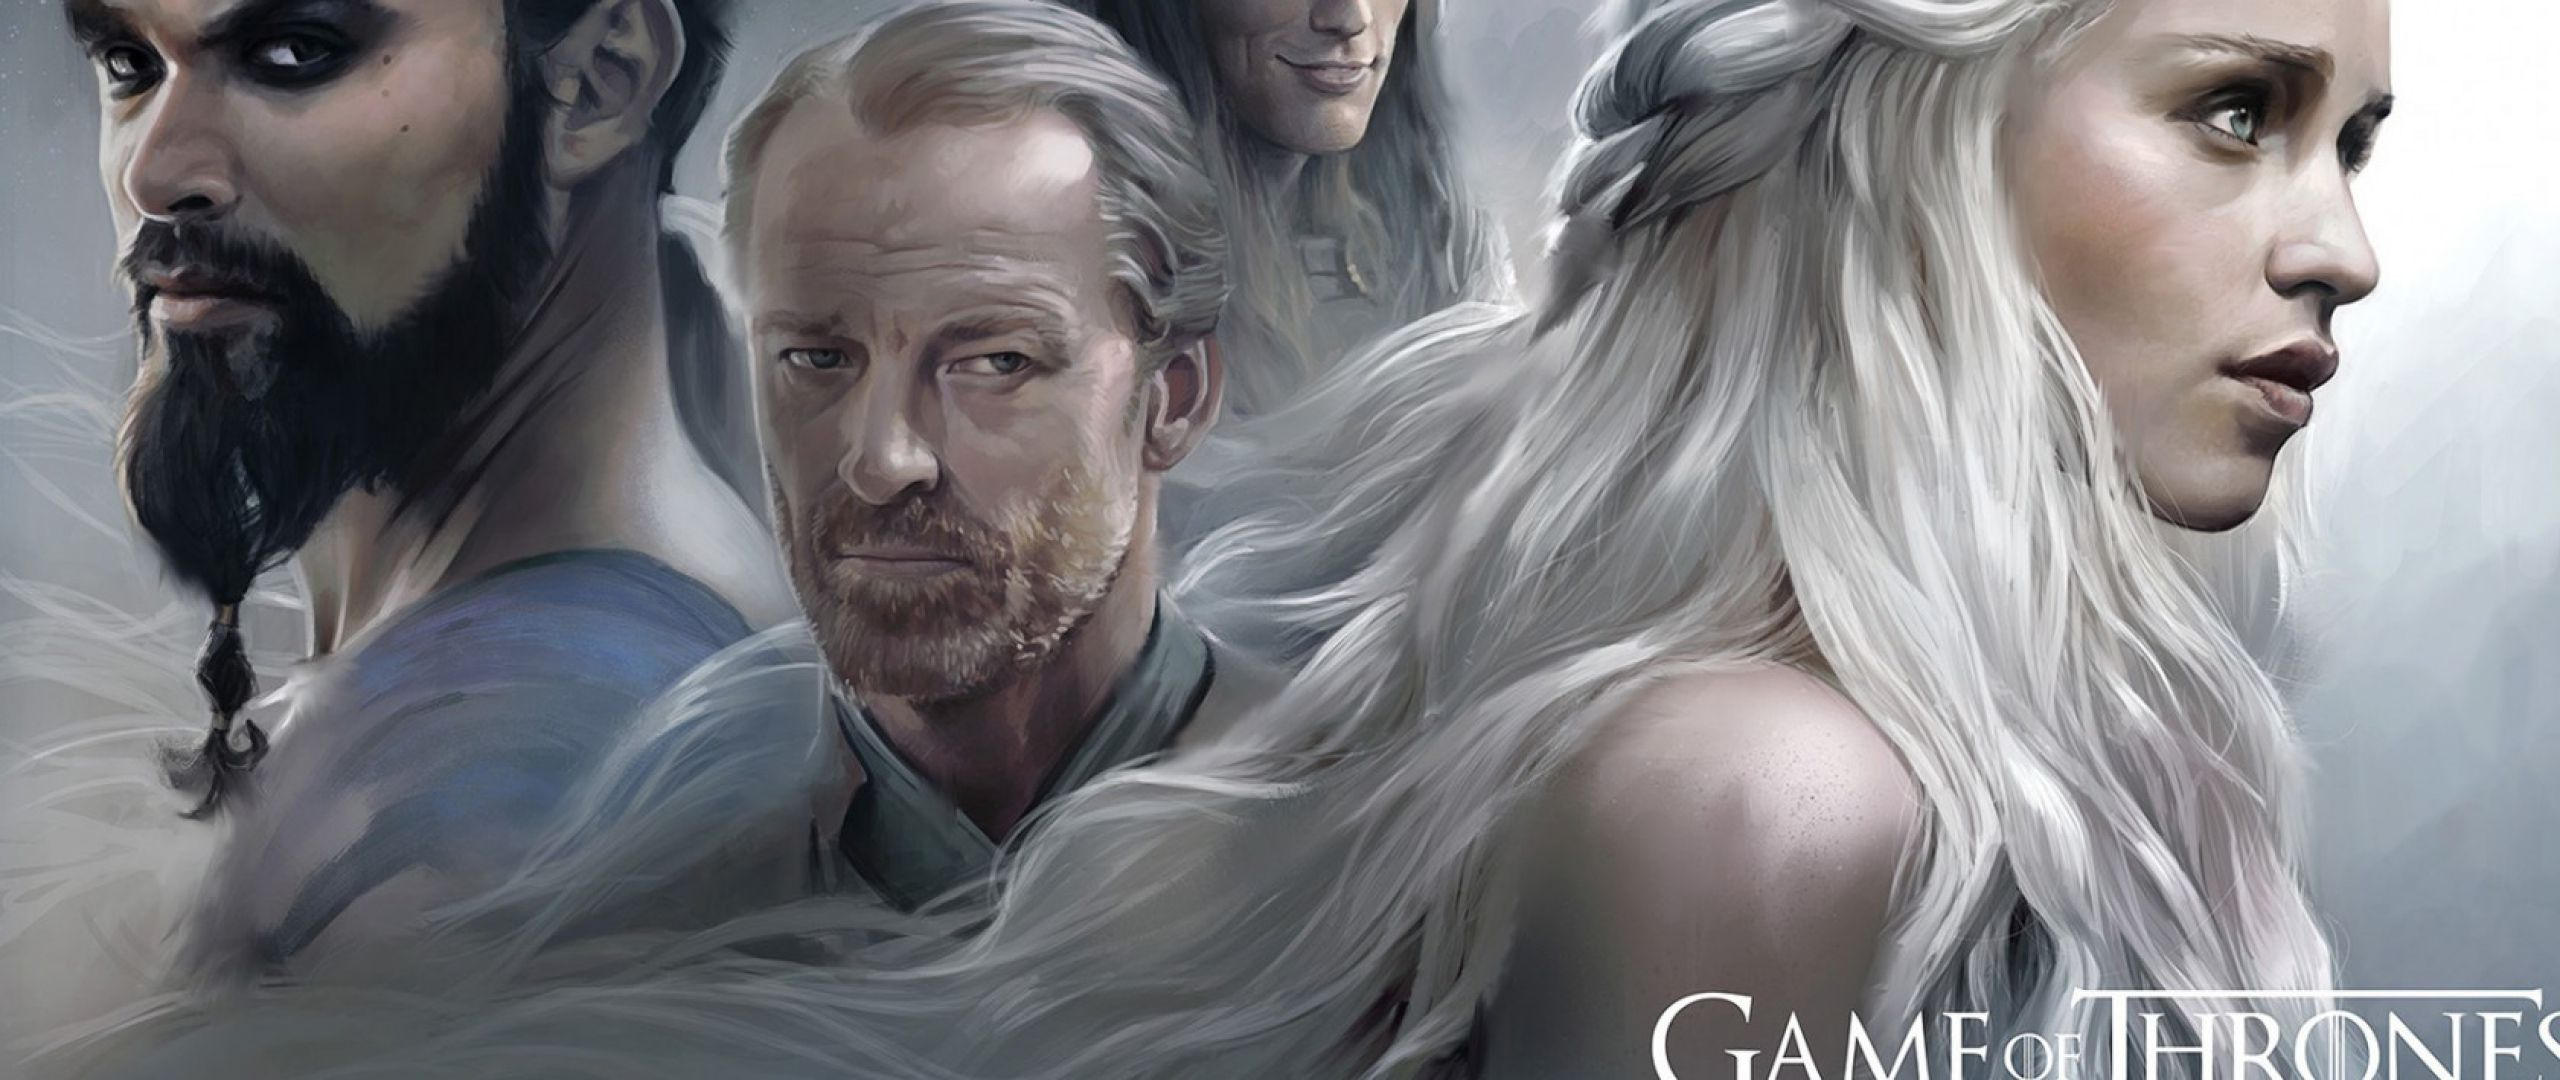 2560x1080 Wallpaper Game Of Thrones Emilia Clarke Daenerys